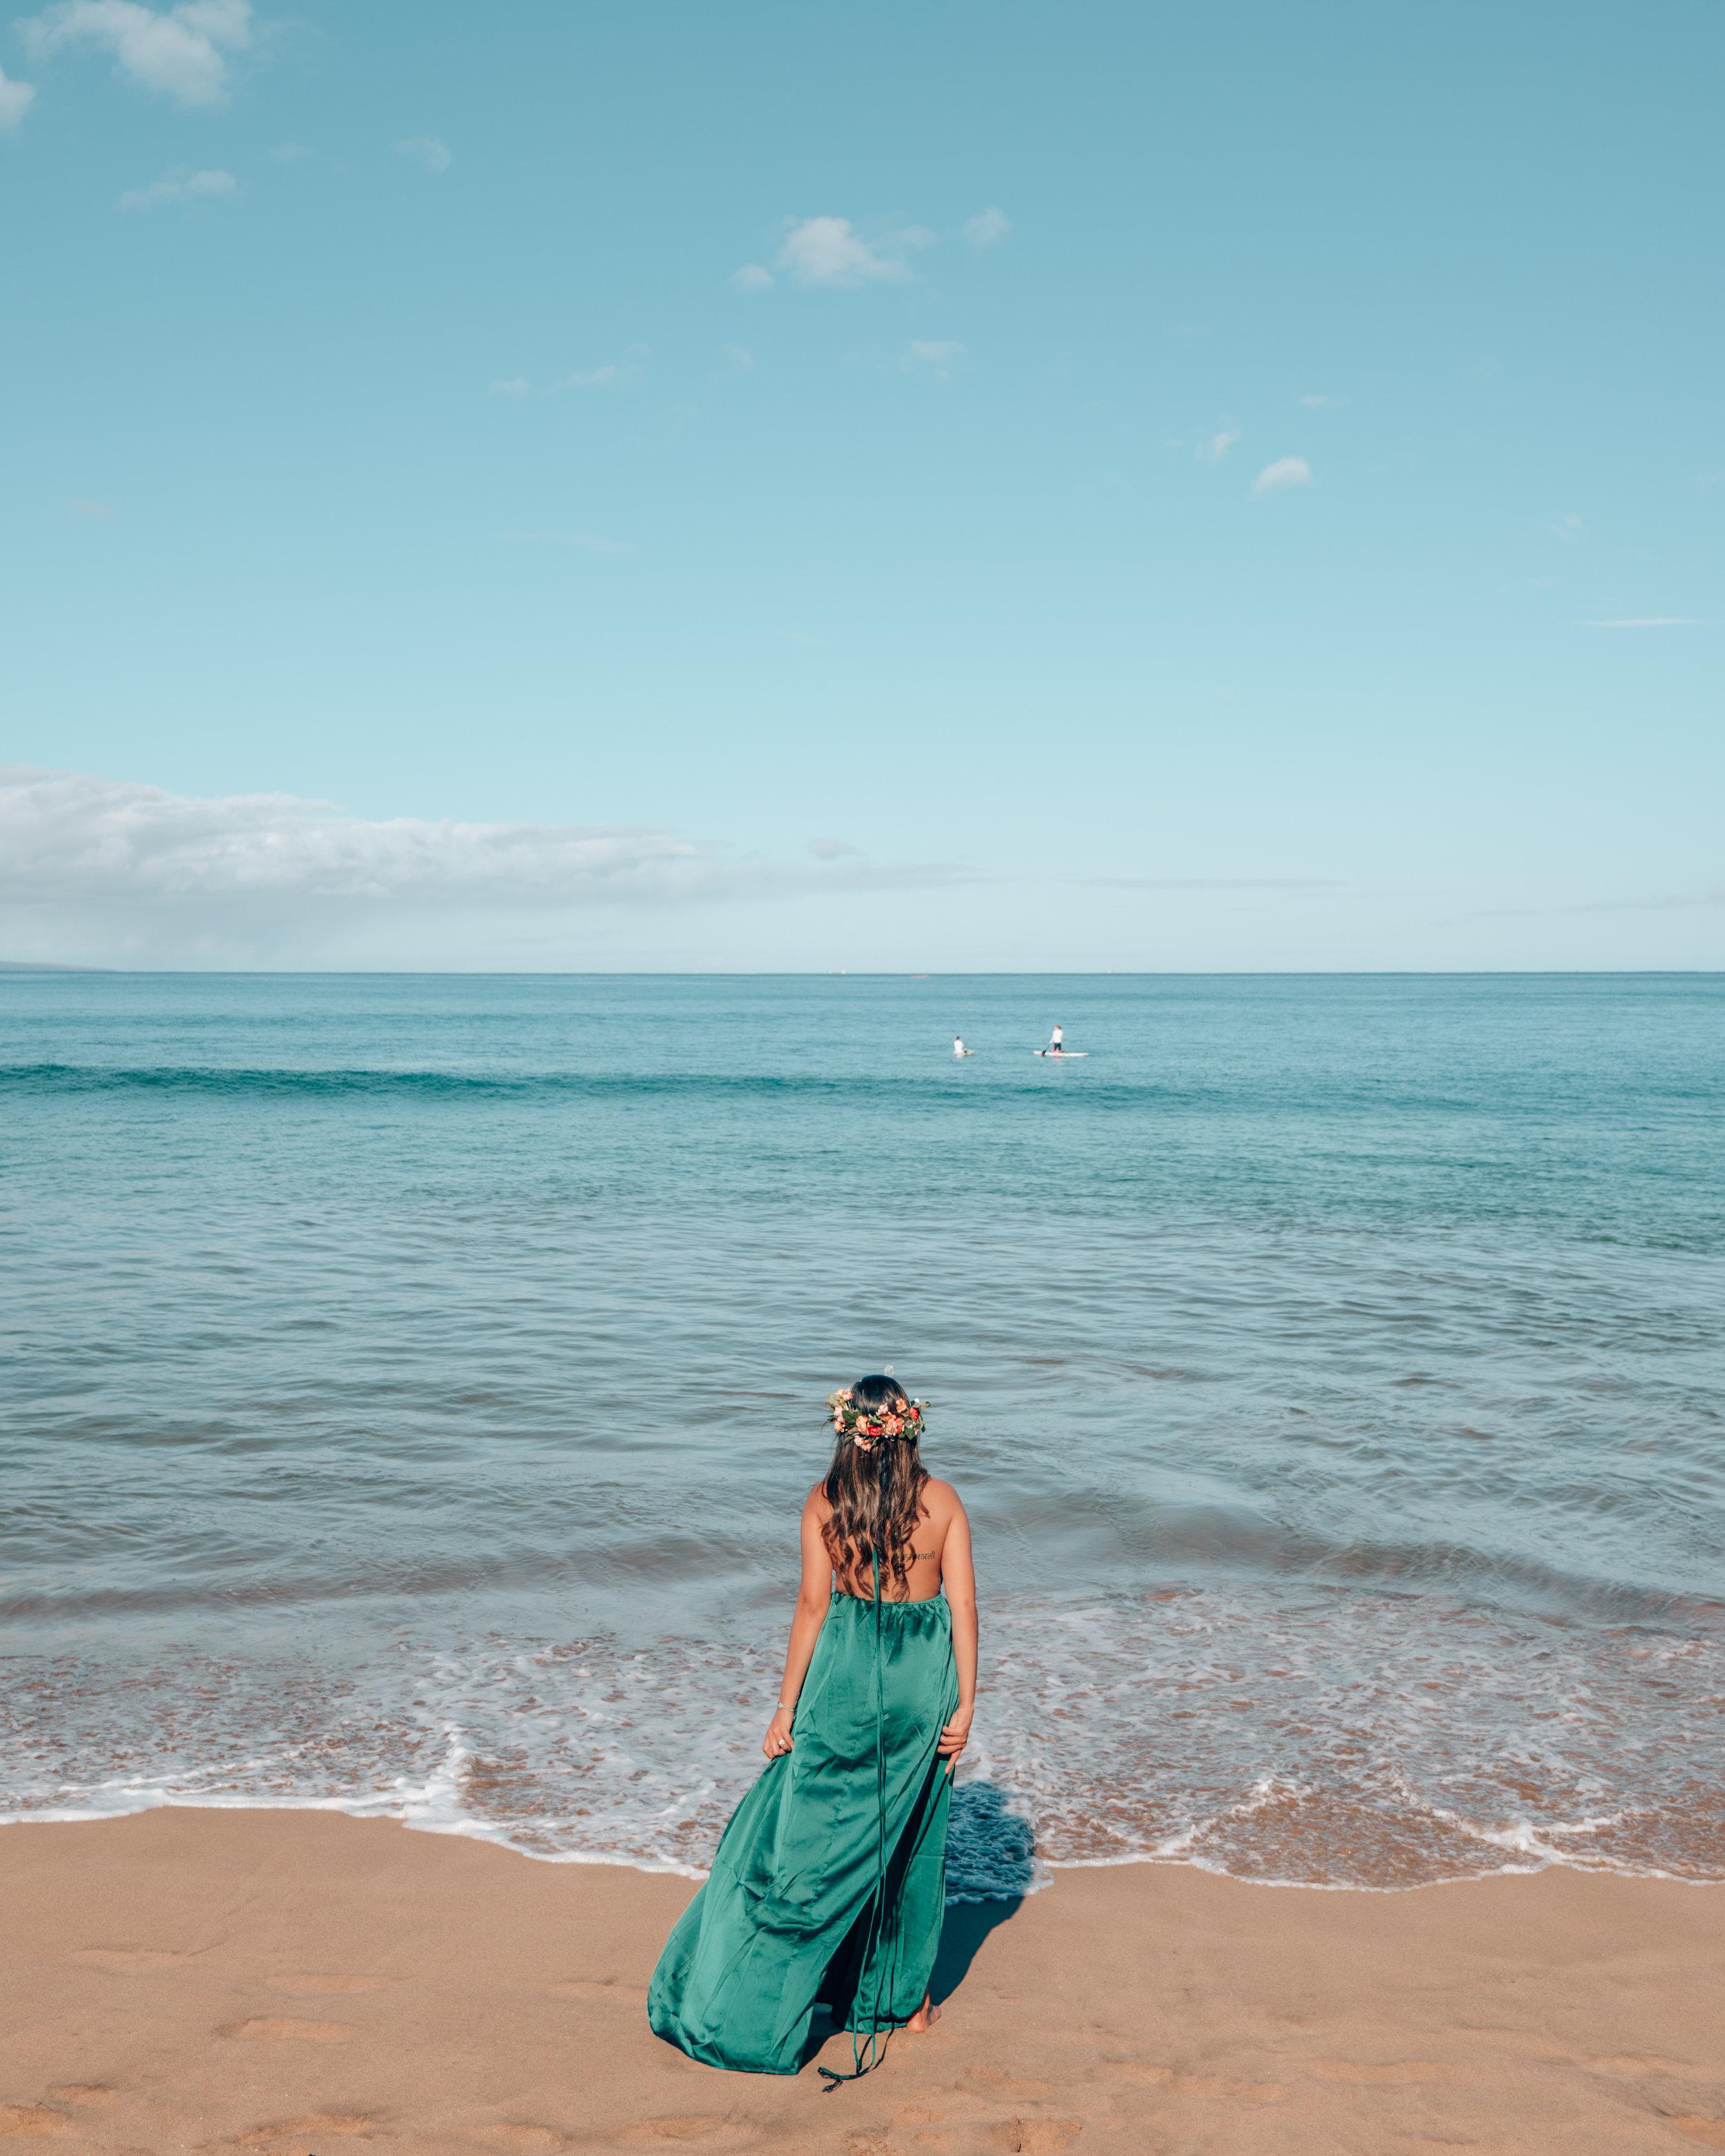 Fun on the Beach - Maui, Hawaii